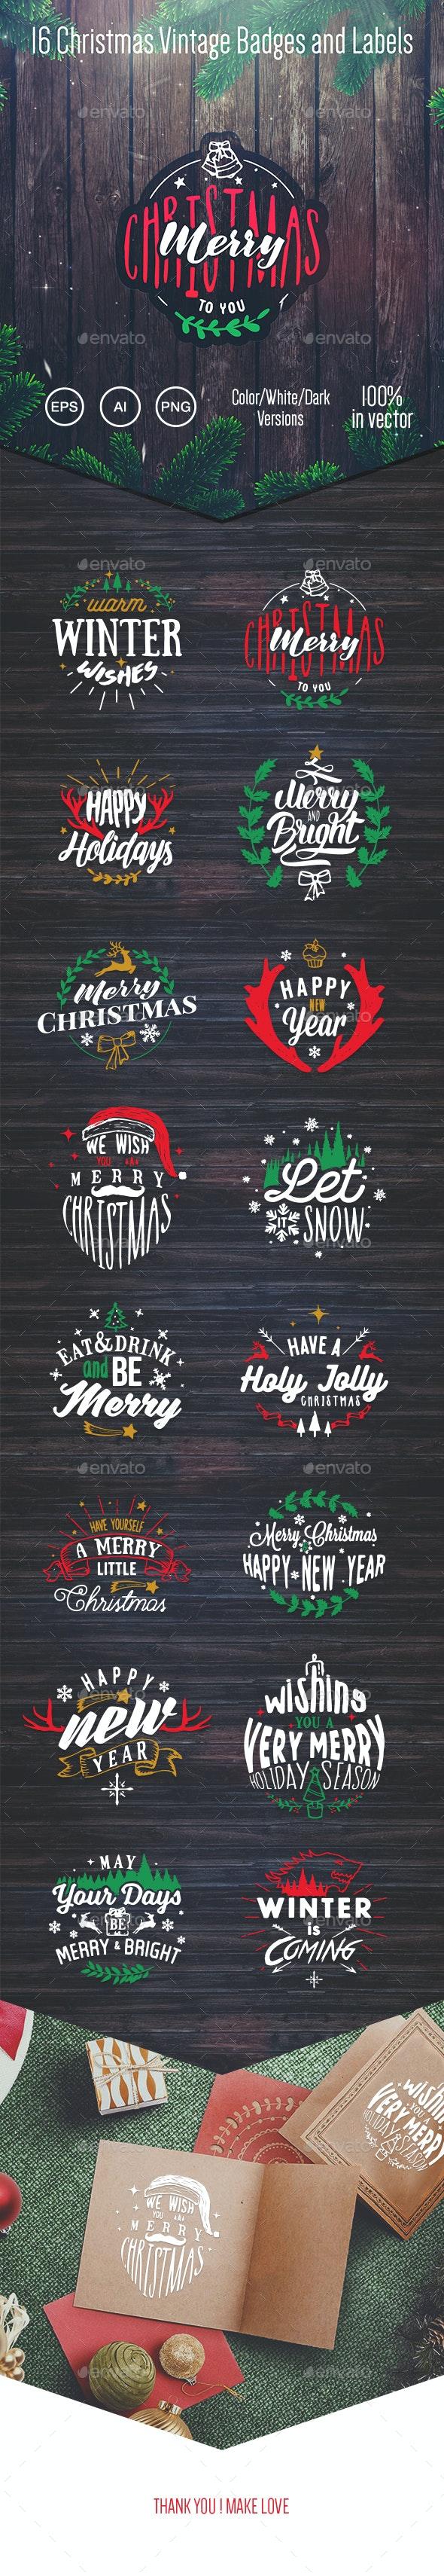 16 Christmas Vintage Badges and Labels - Badges & Stickers Web Elements